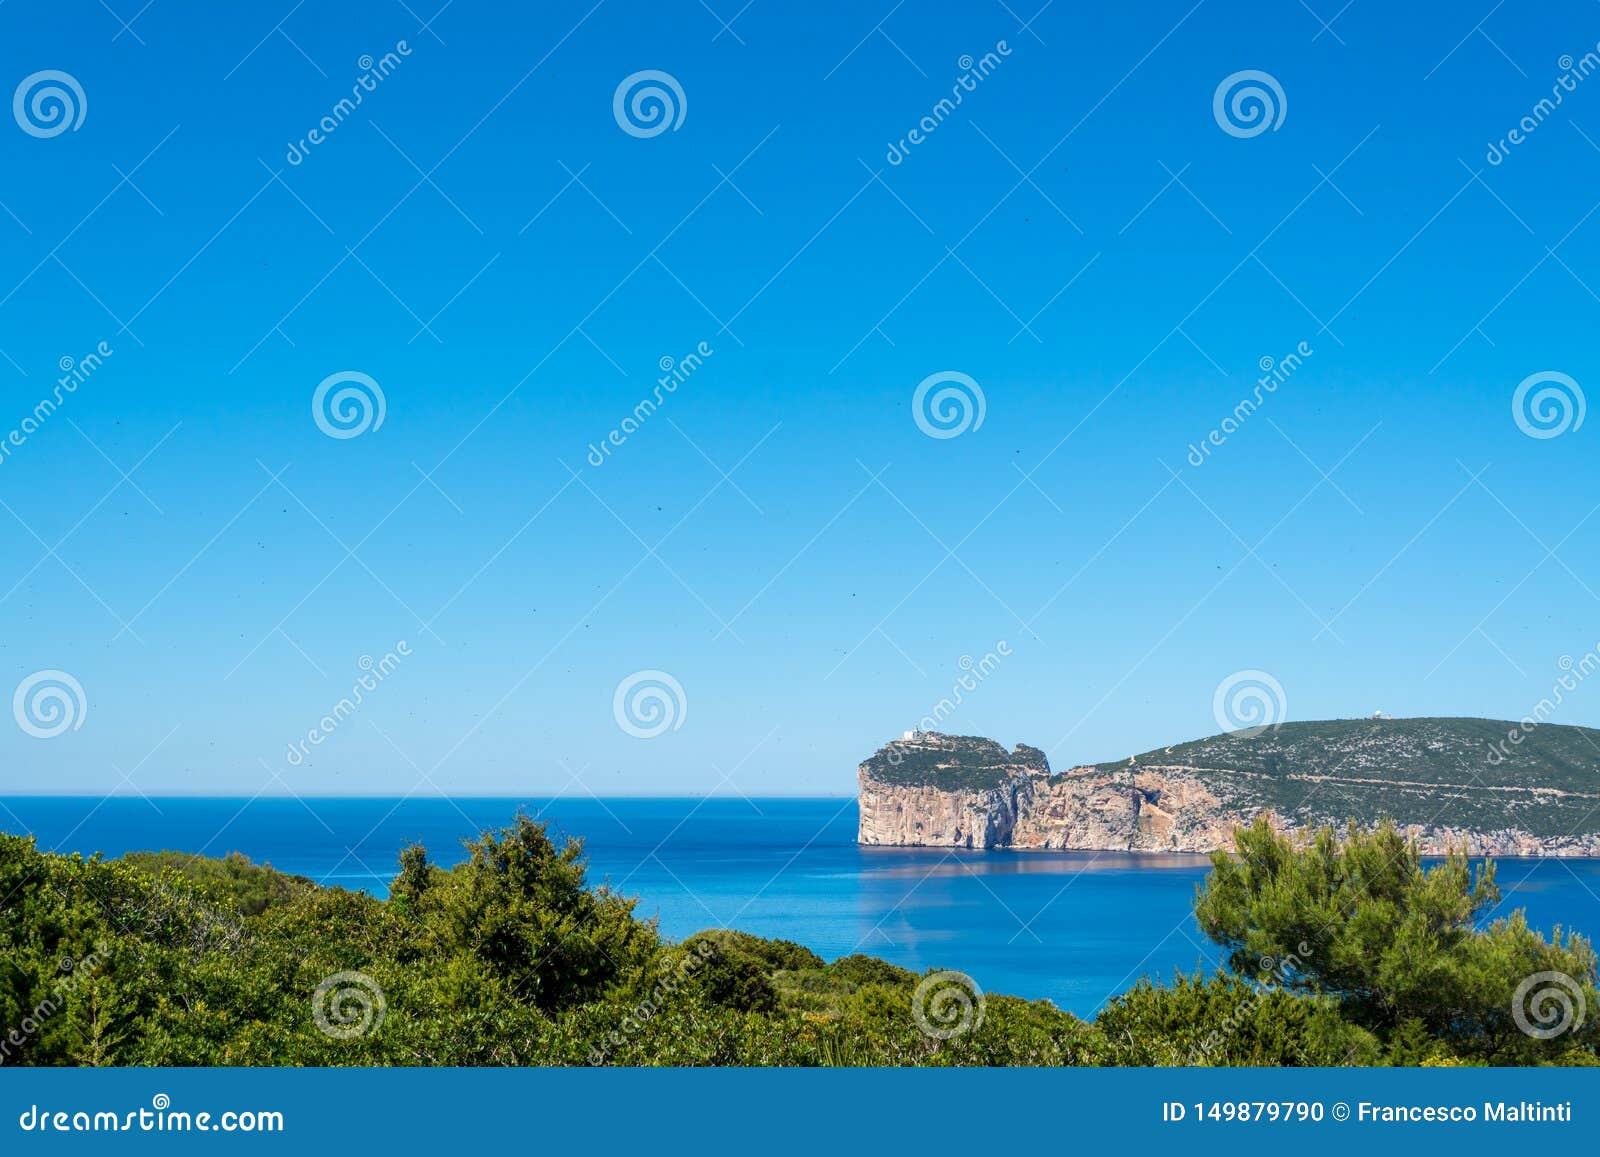 Ландшафт побережья каподастра Caccia, в Сардинии